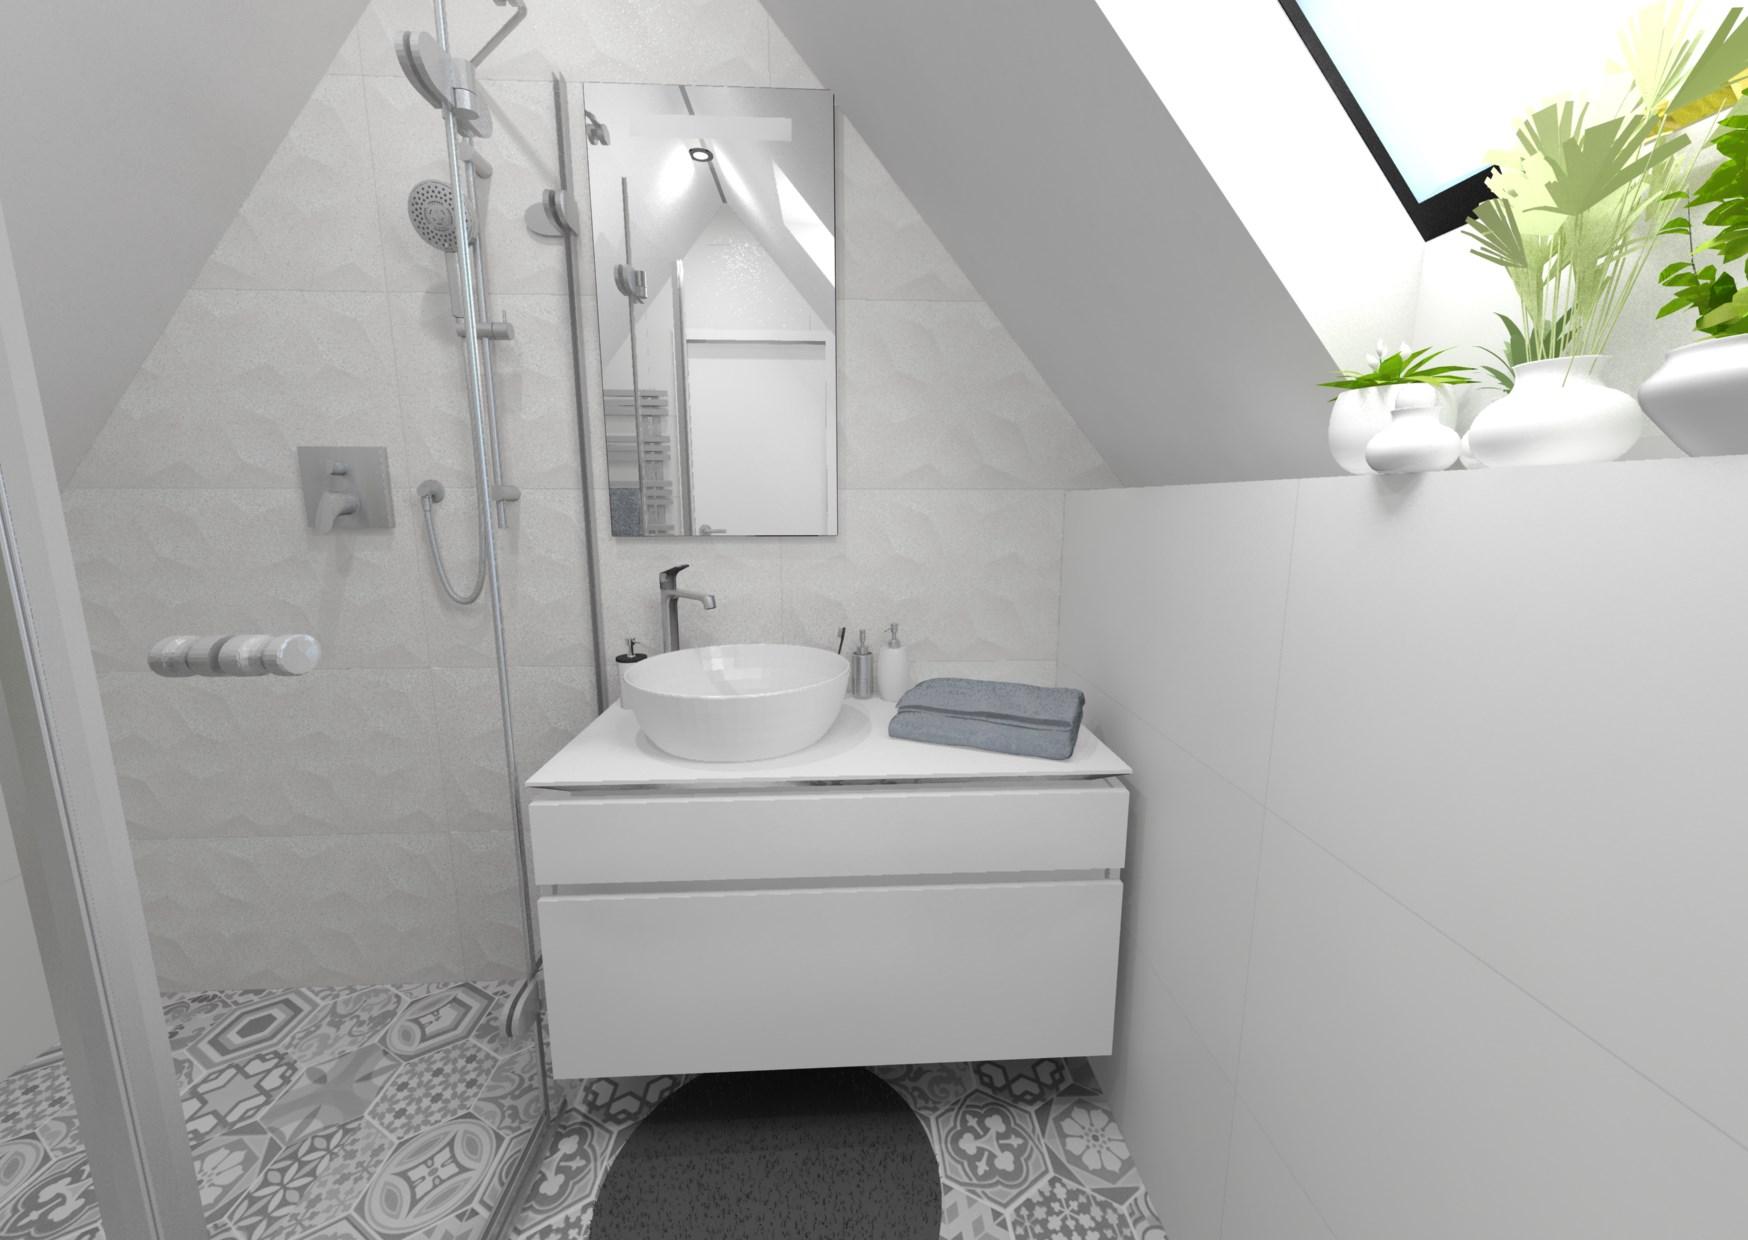 Návrh retro koupelny 0